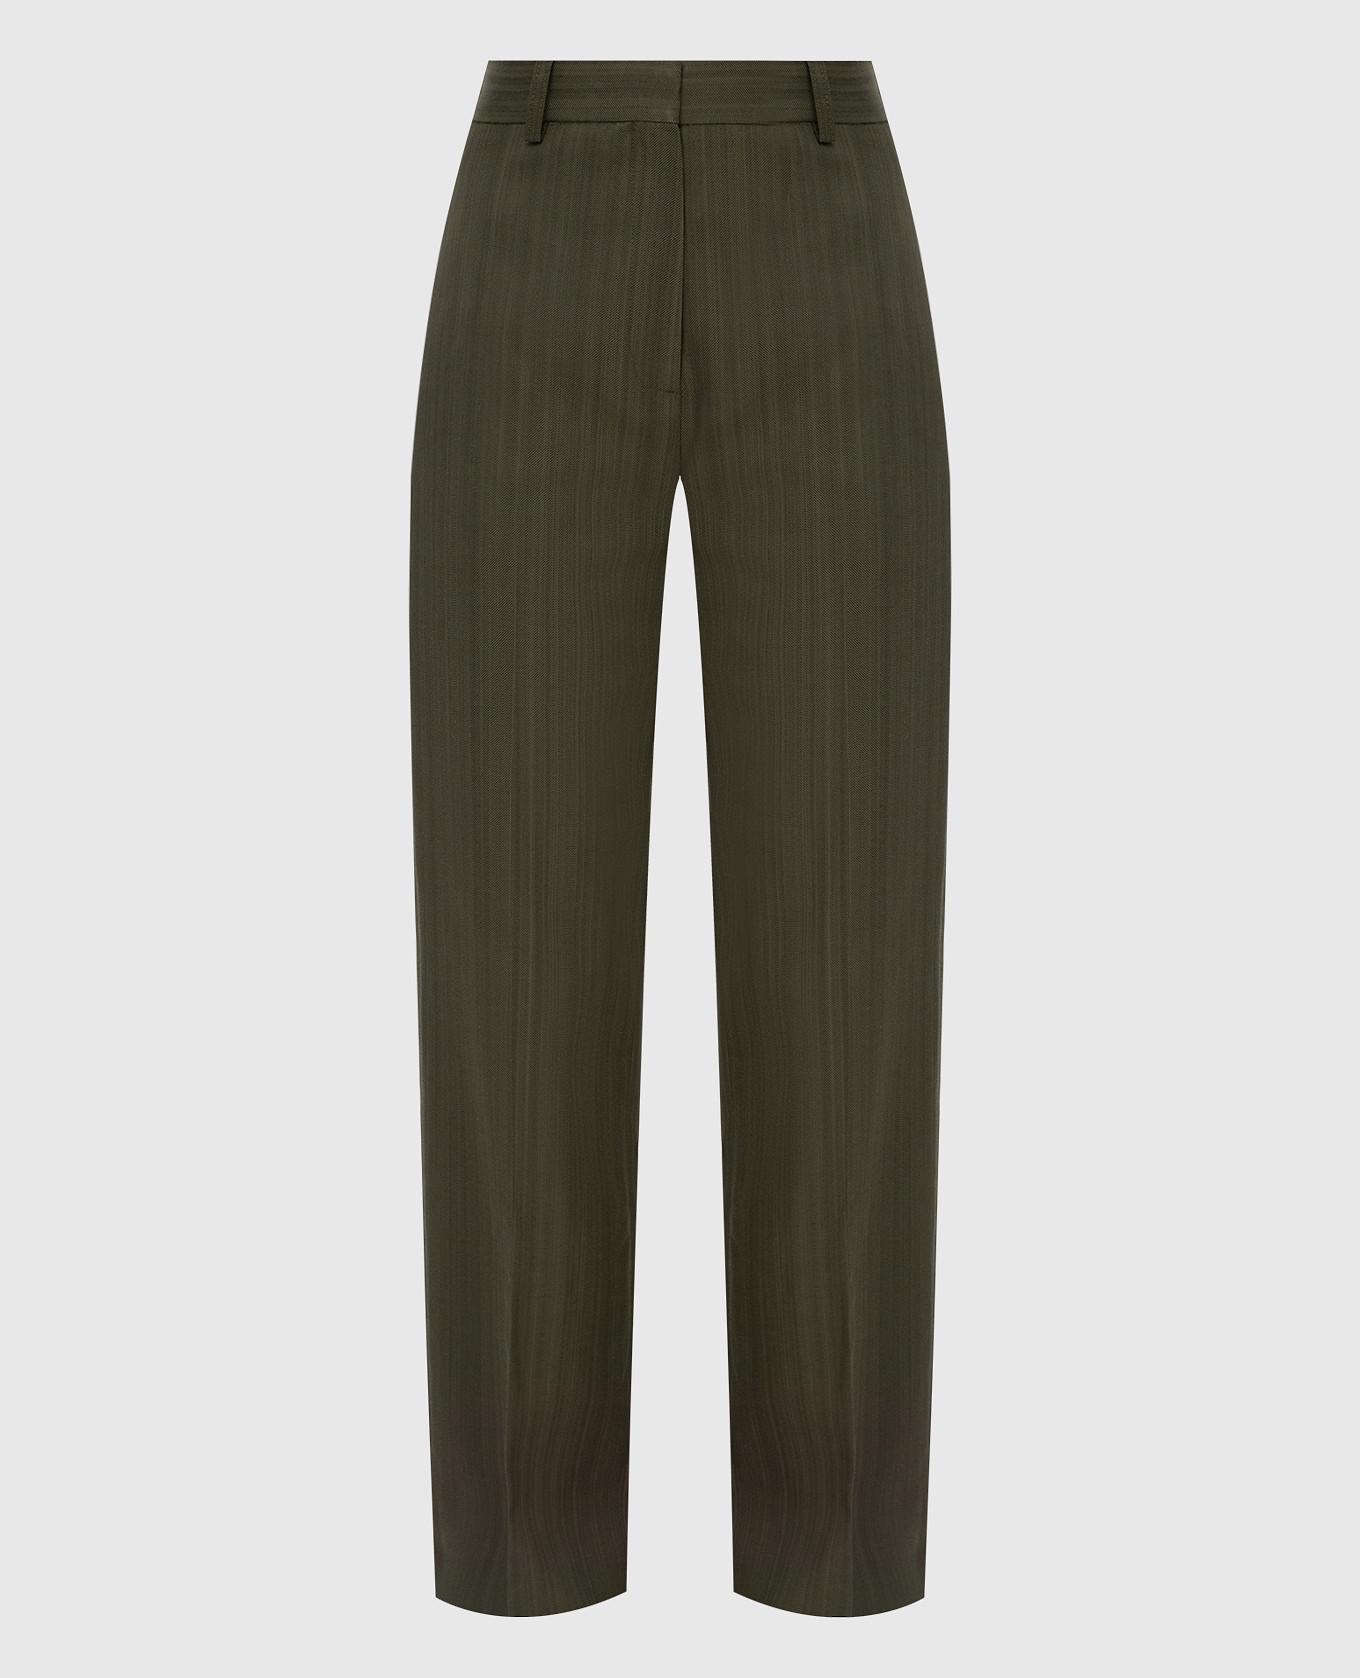 Брюки с защипами Toteme, Хаки, Повседневные брюки casual